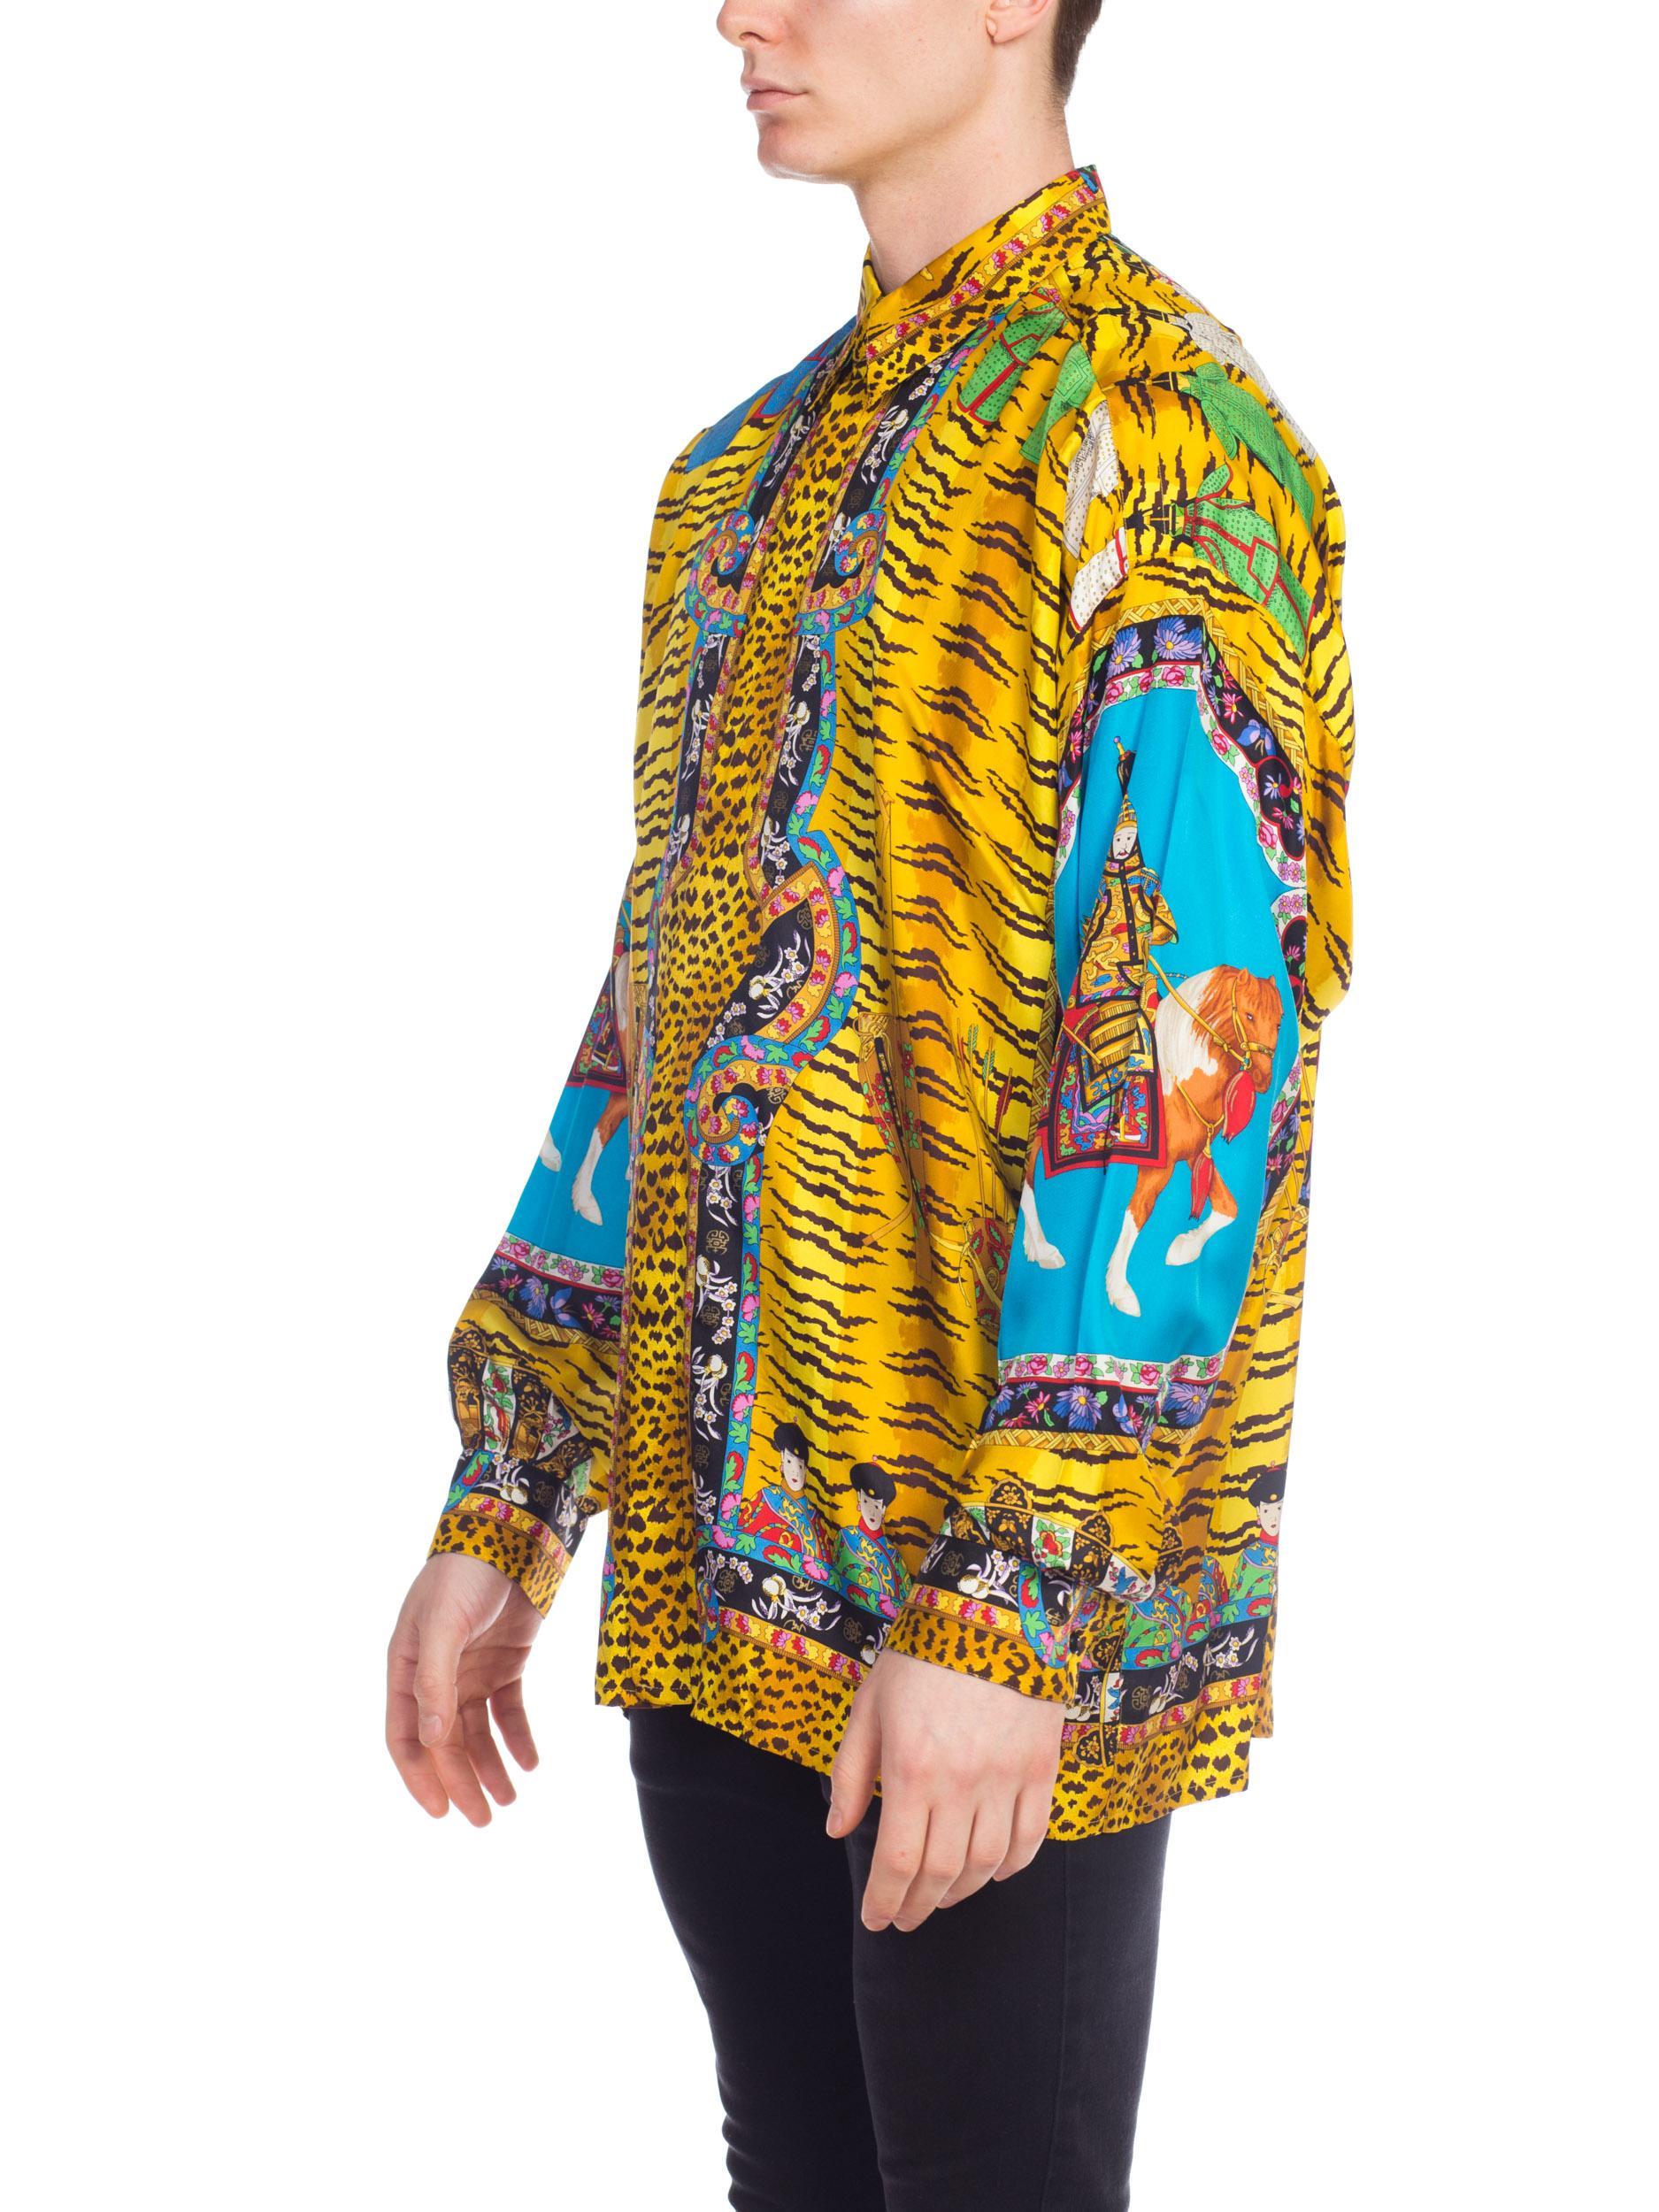 01b218d6c Rare Chinese Emperor Gianni Versace Silk Shirt Mens at 1stdibs